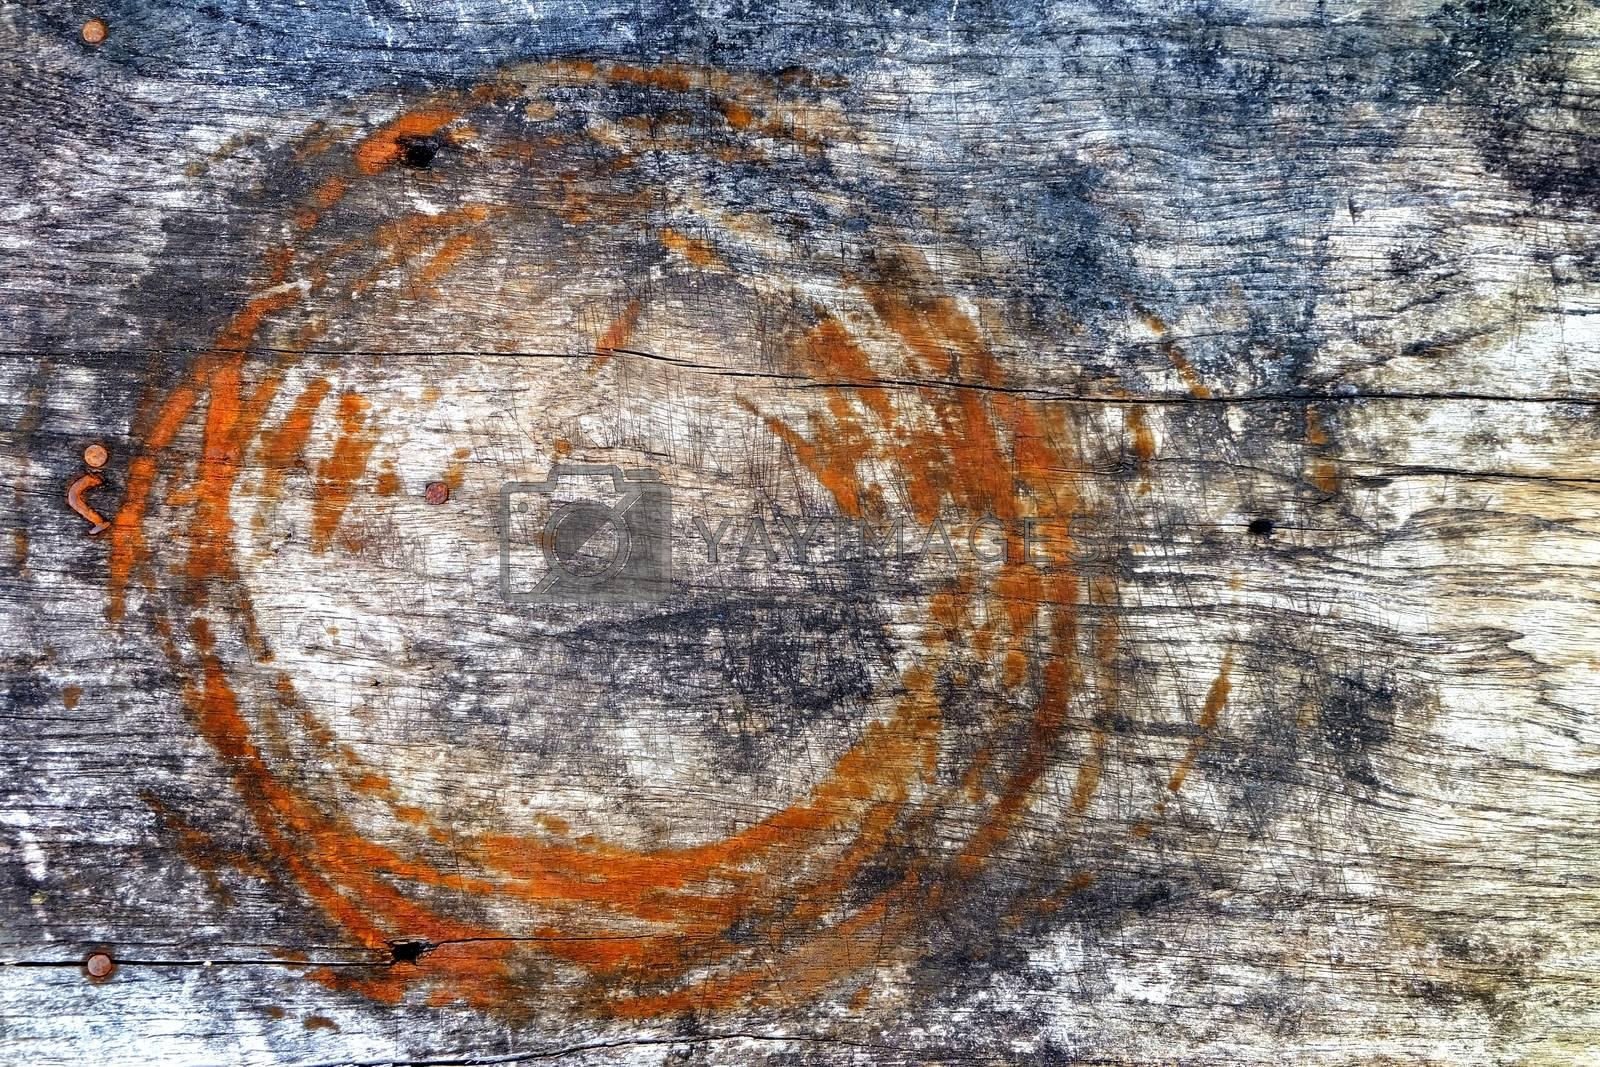 Old Grunge Wooden Board Background.